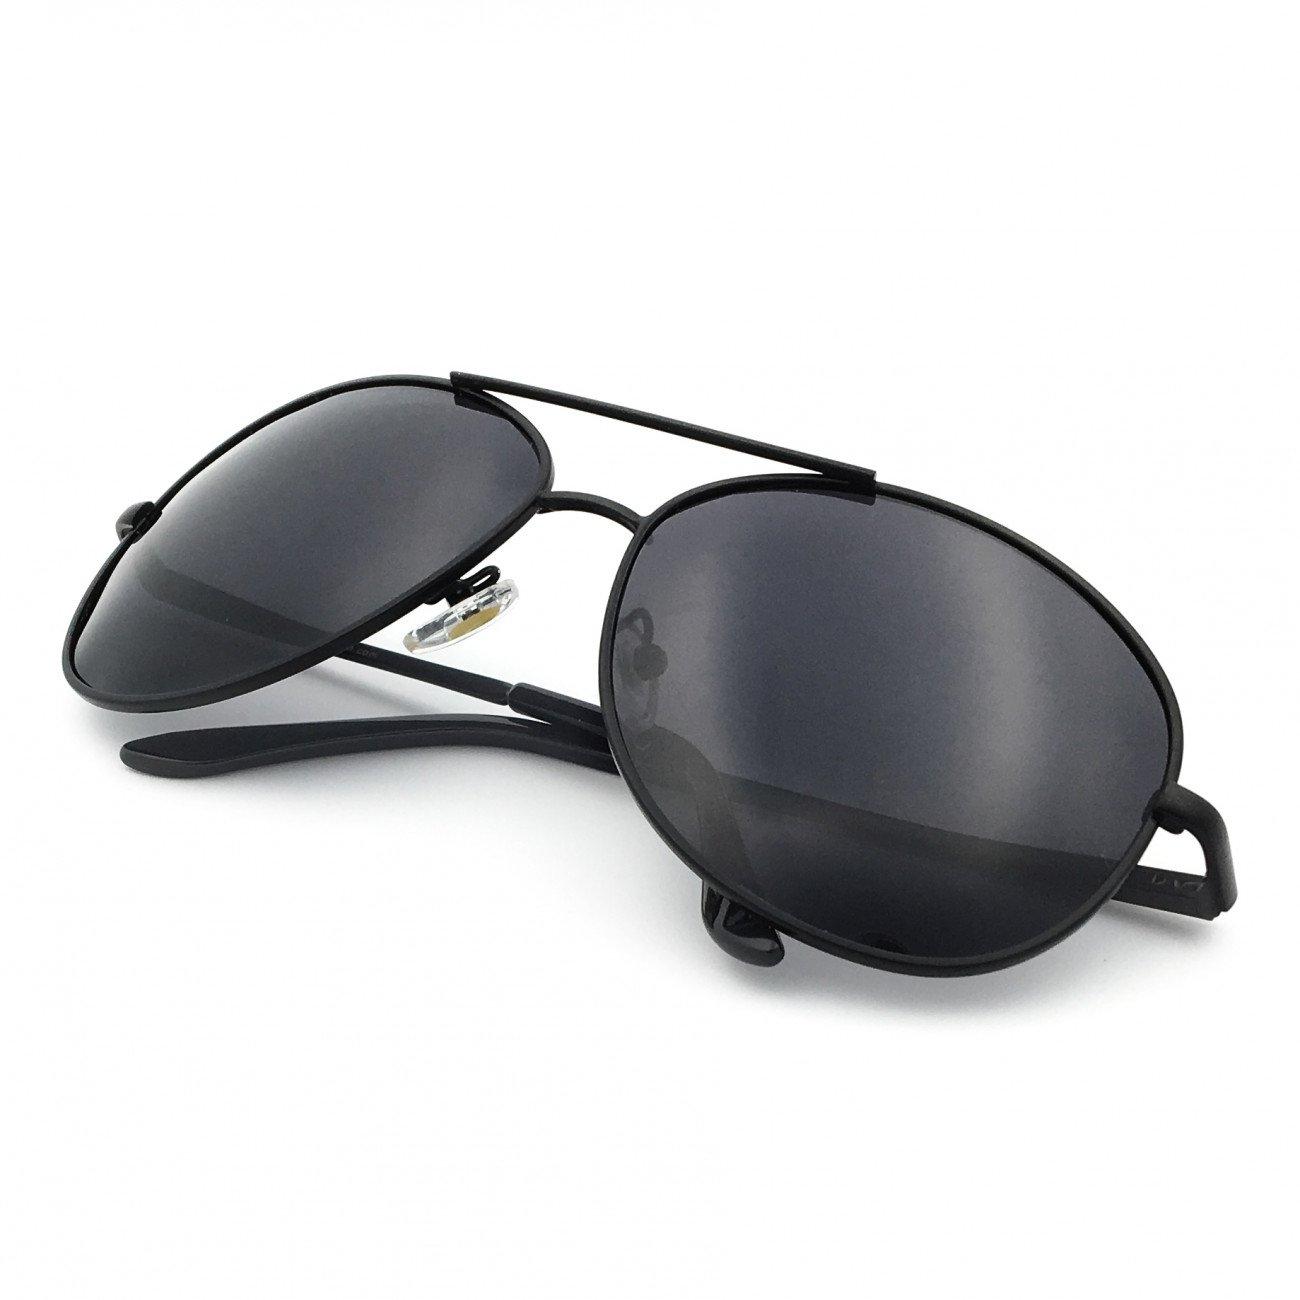 f797459fc J+S Premium Military Style Classic Aviator Sunglasses, Polarized ...